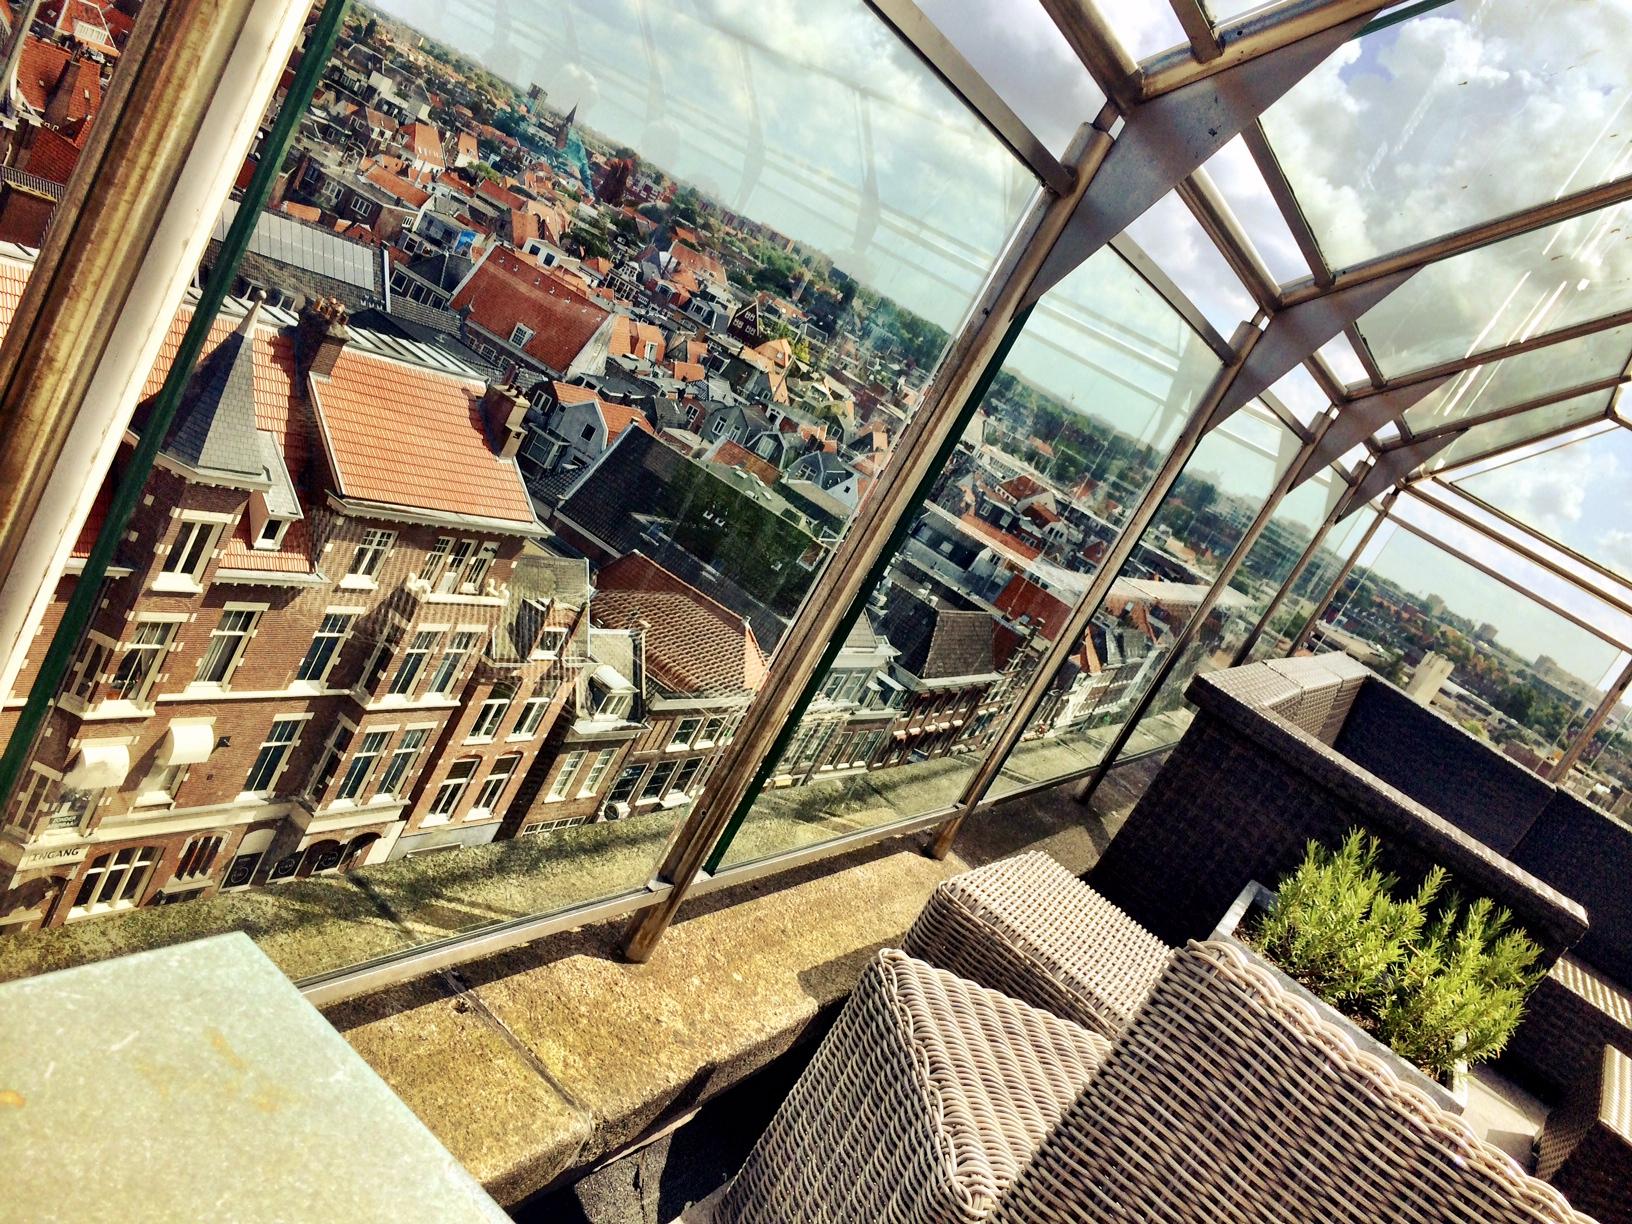 La Place dakterras Haarlem